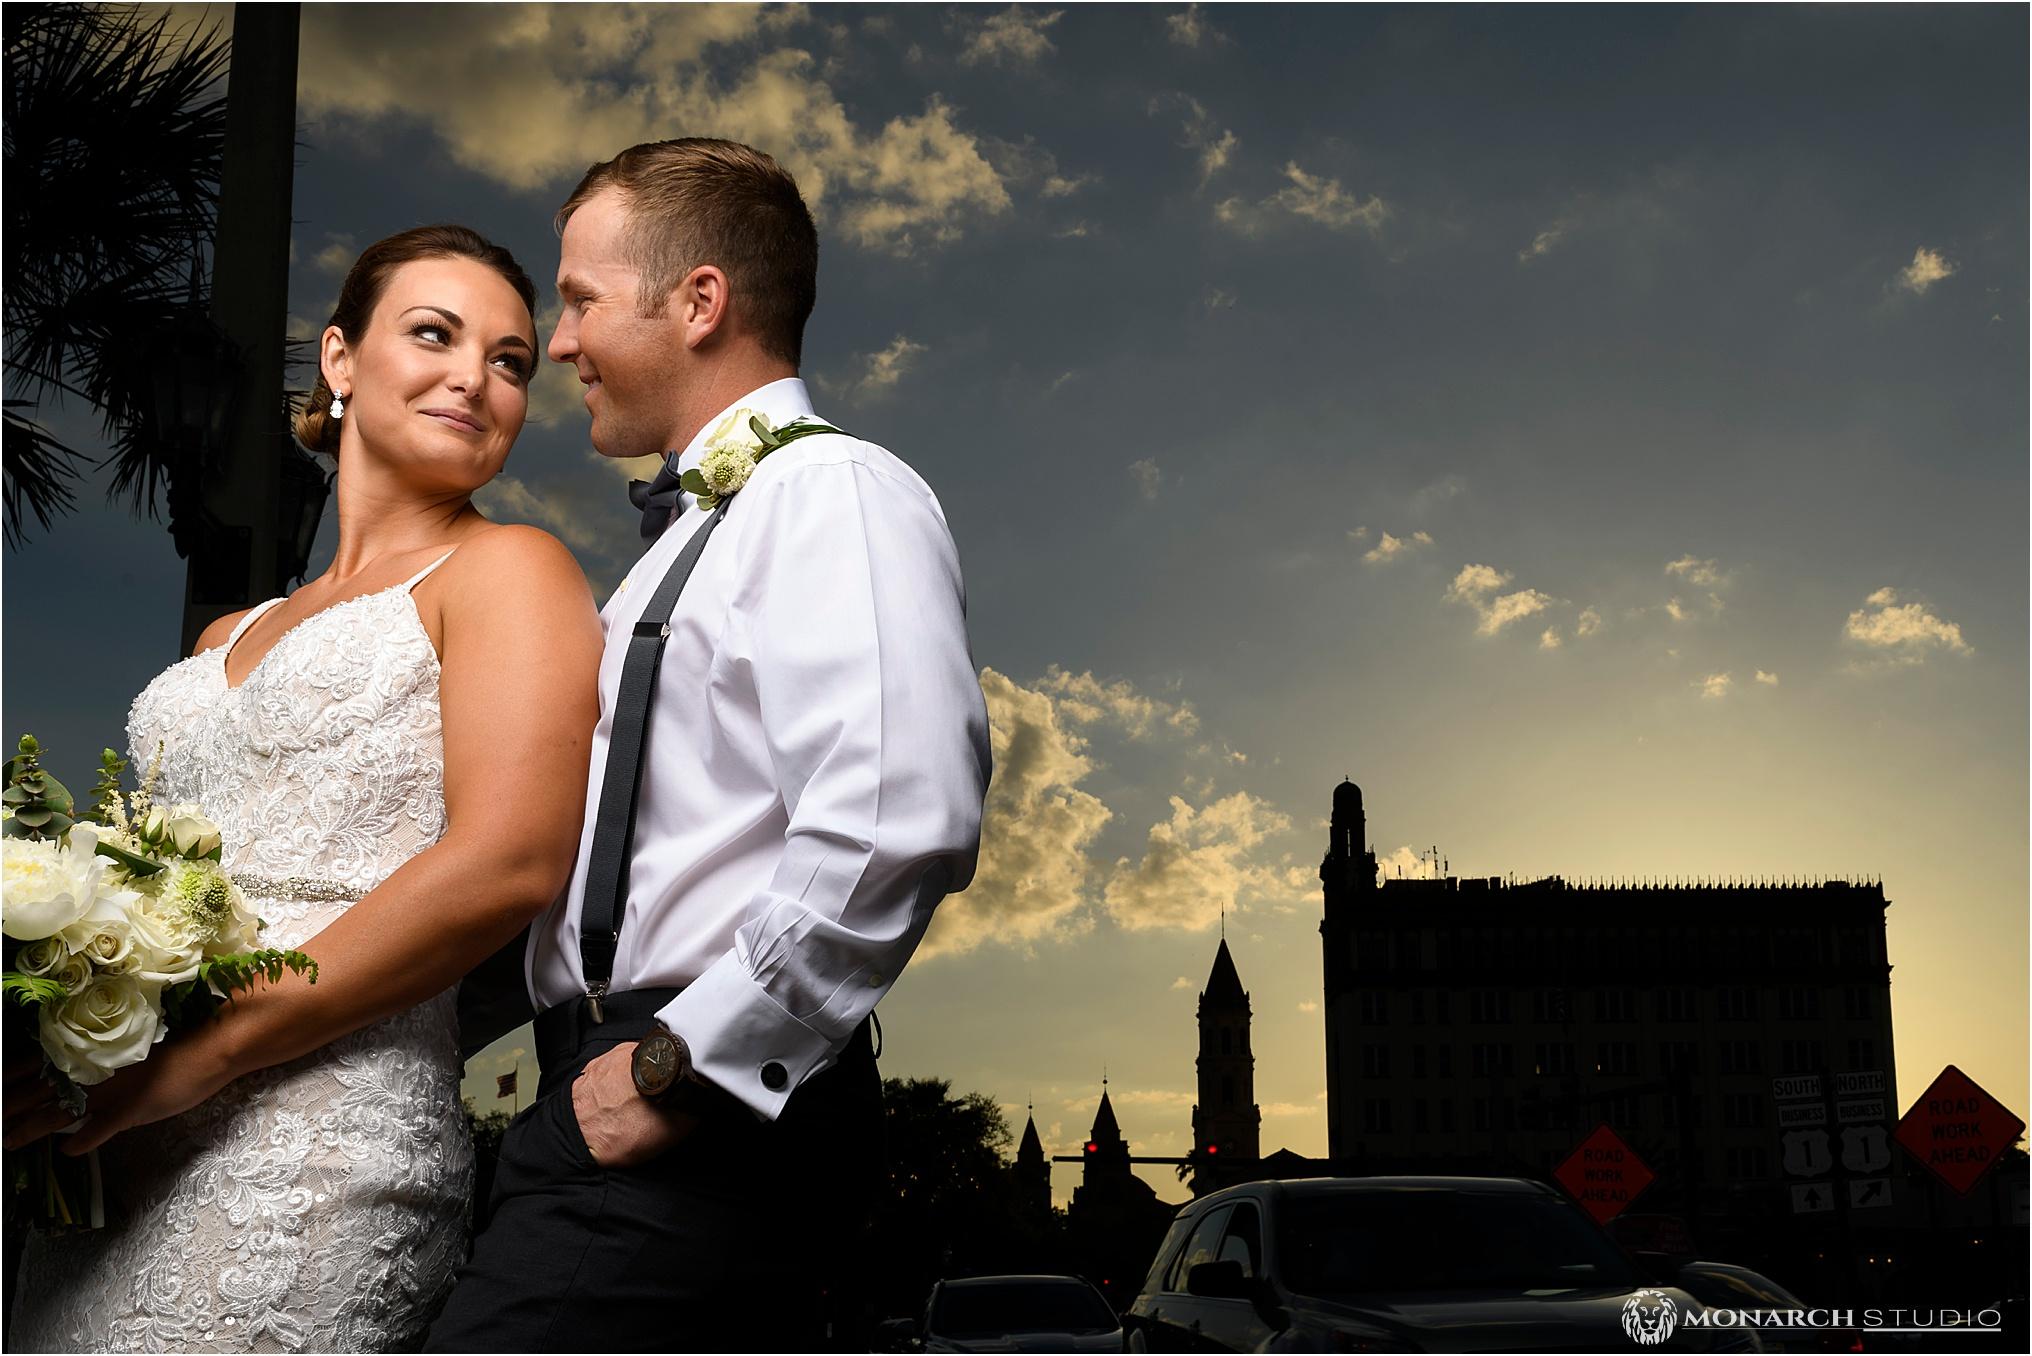 089-whiteroom-wedding-photographer-2019-05-22_0071.jpg